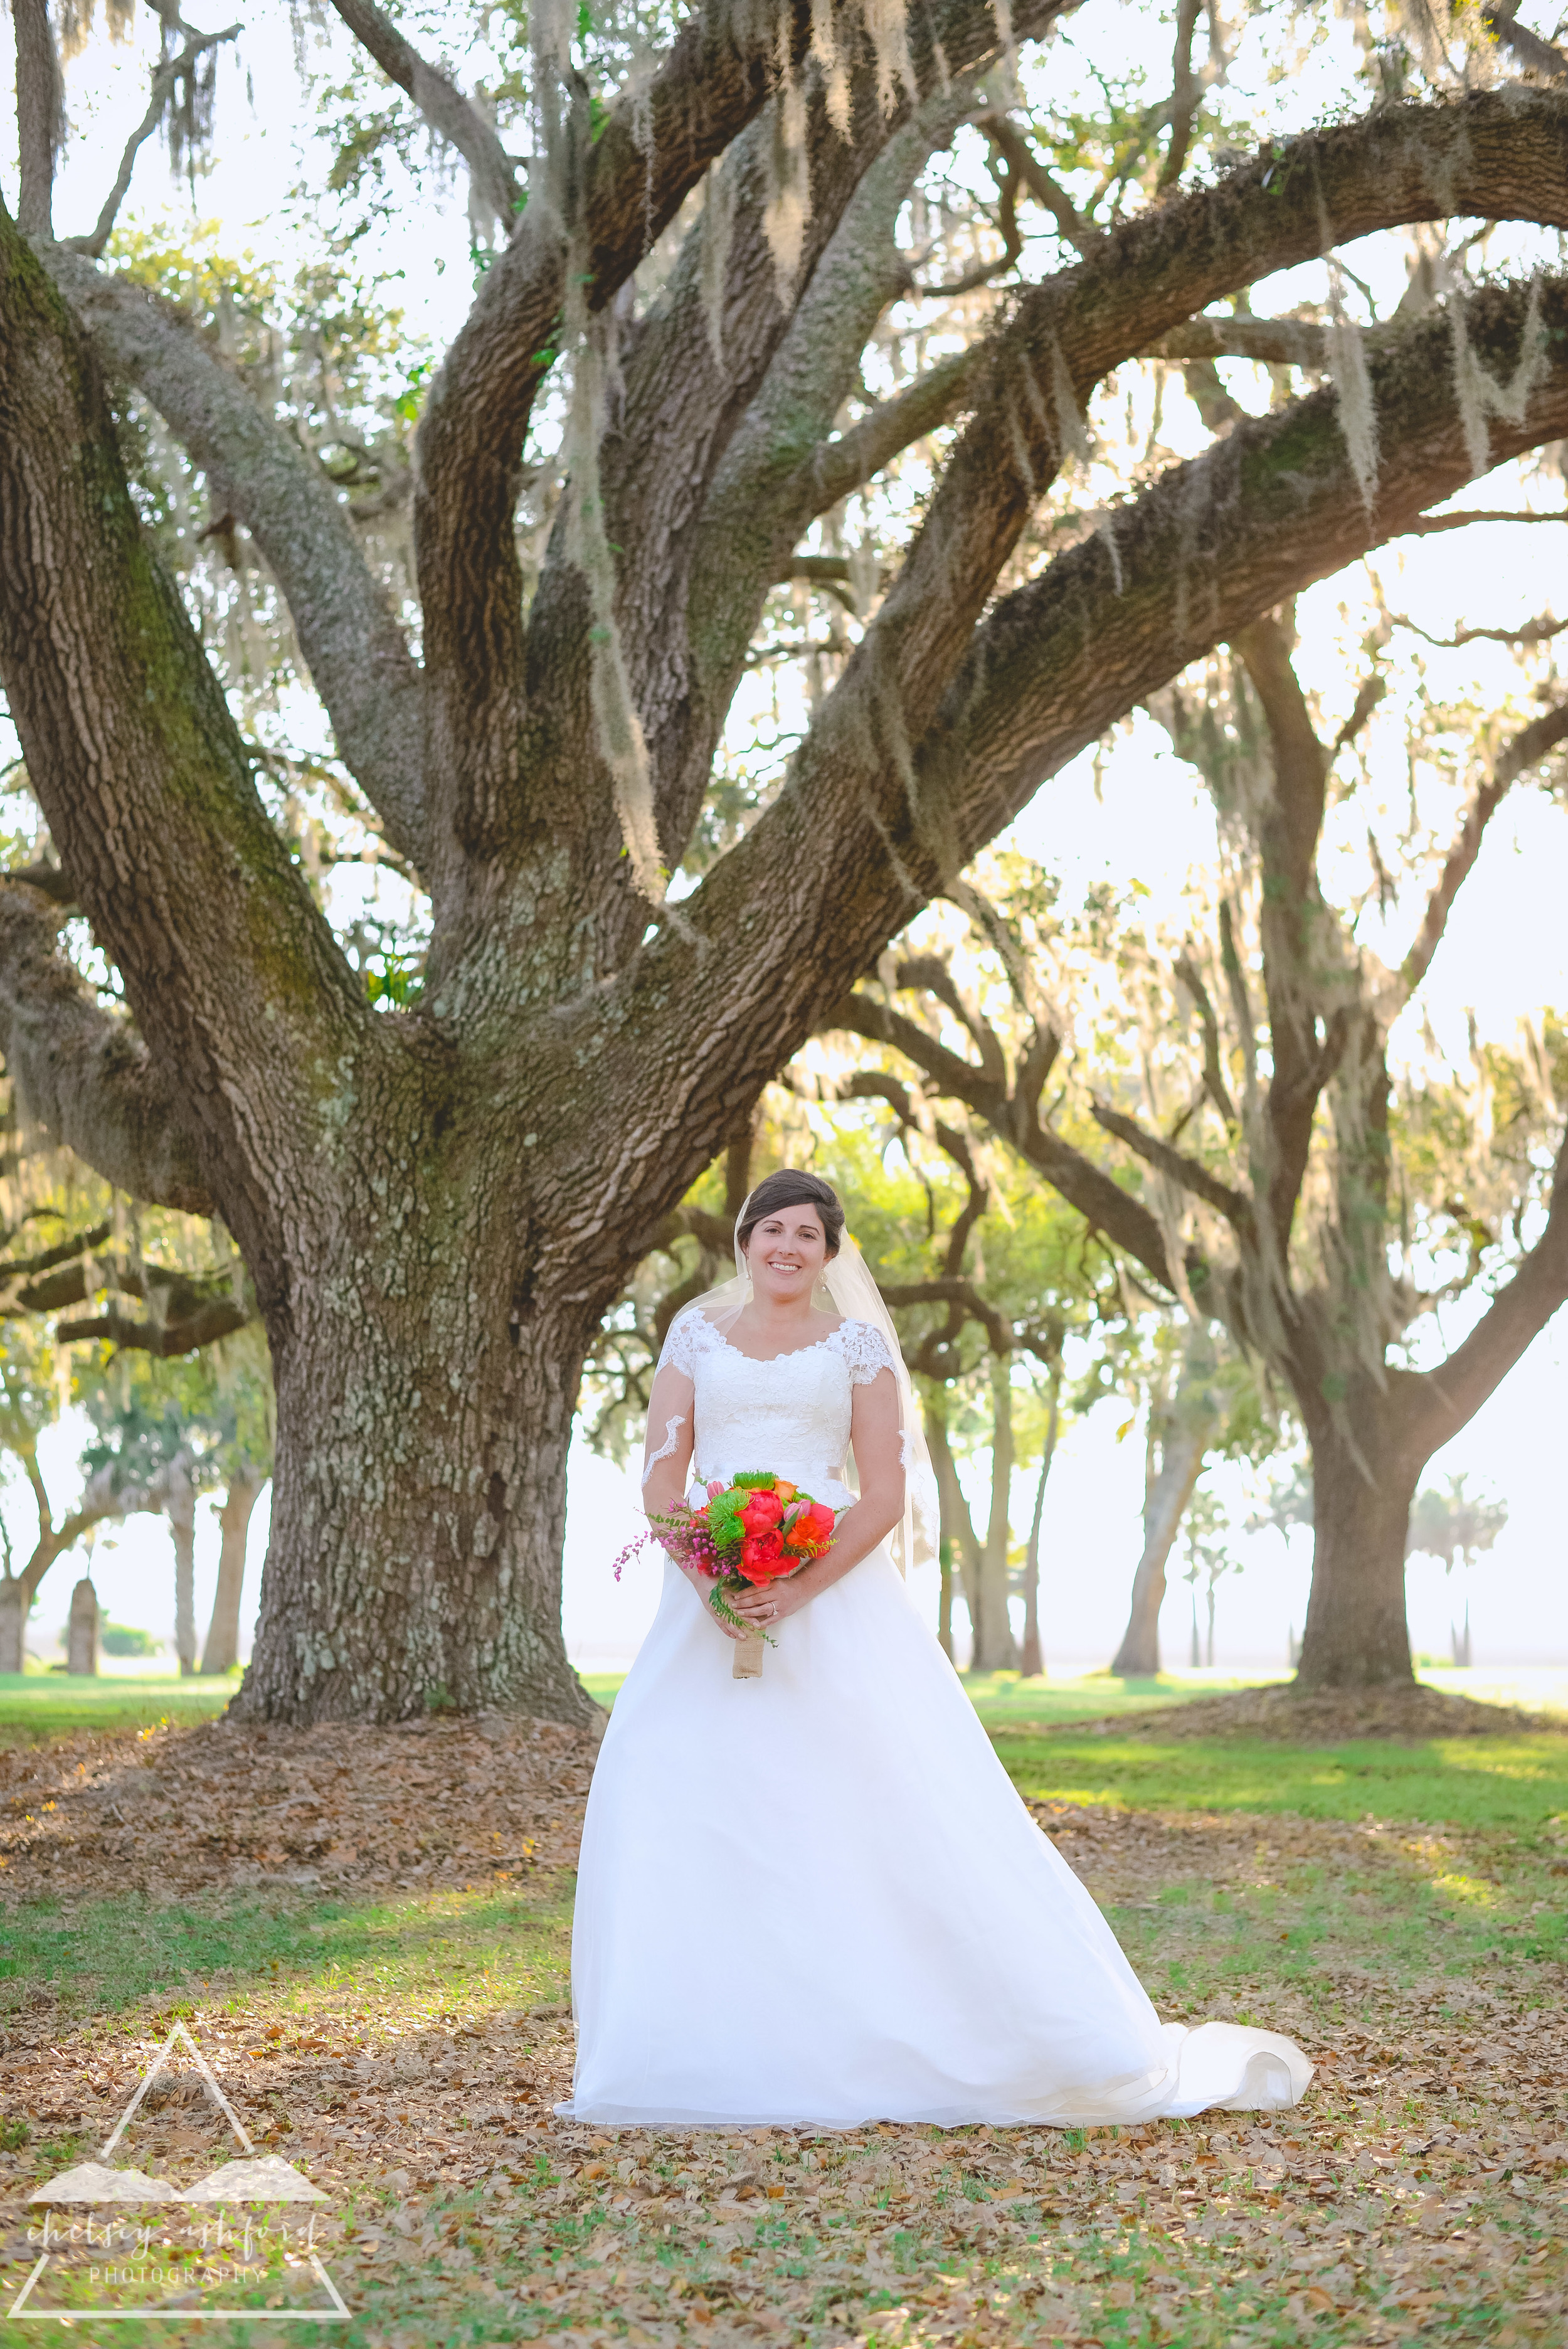 Sylvia_bridals_web-10.jpg